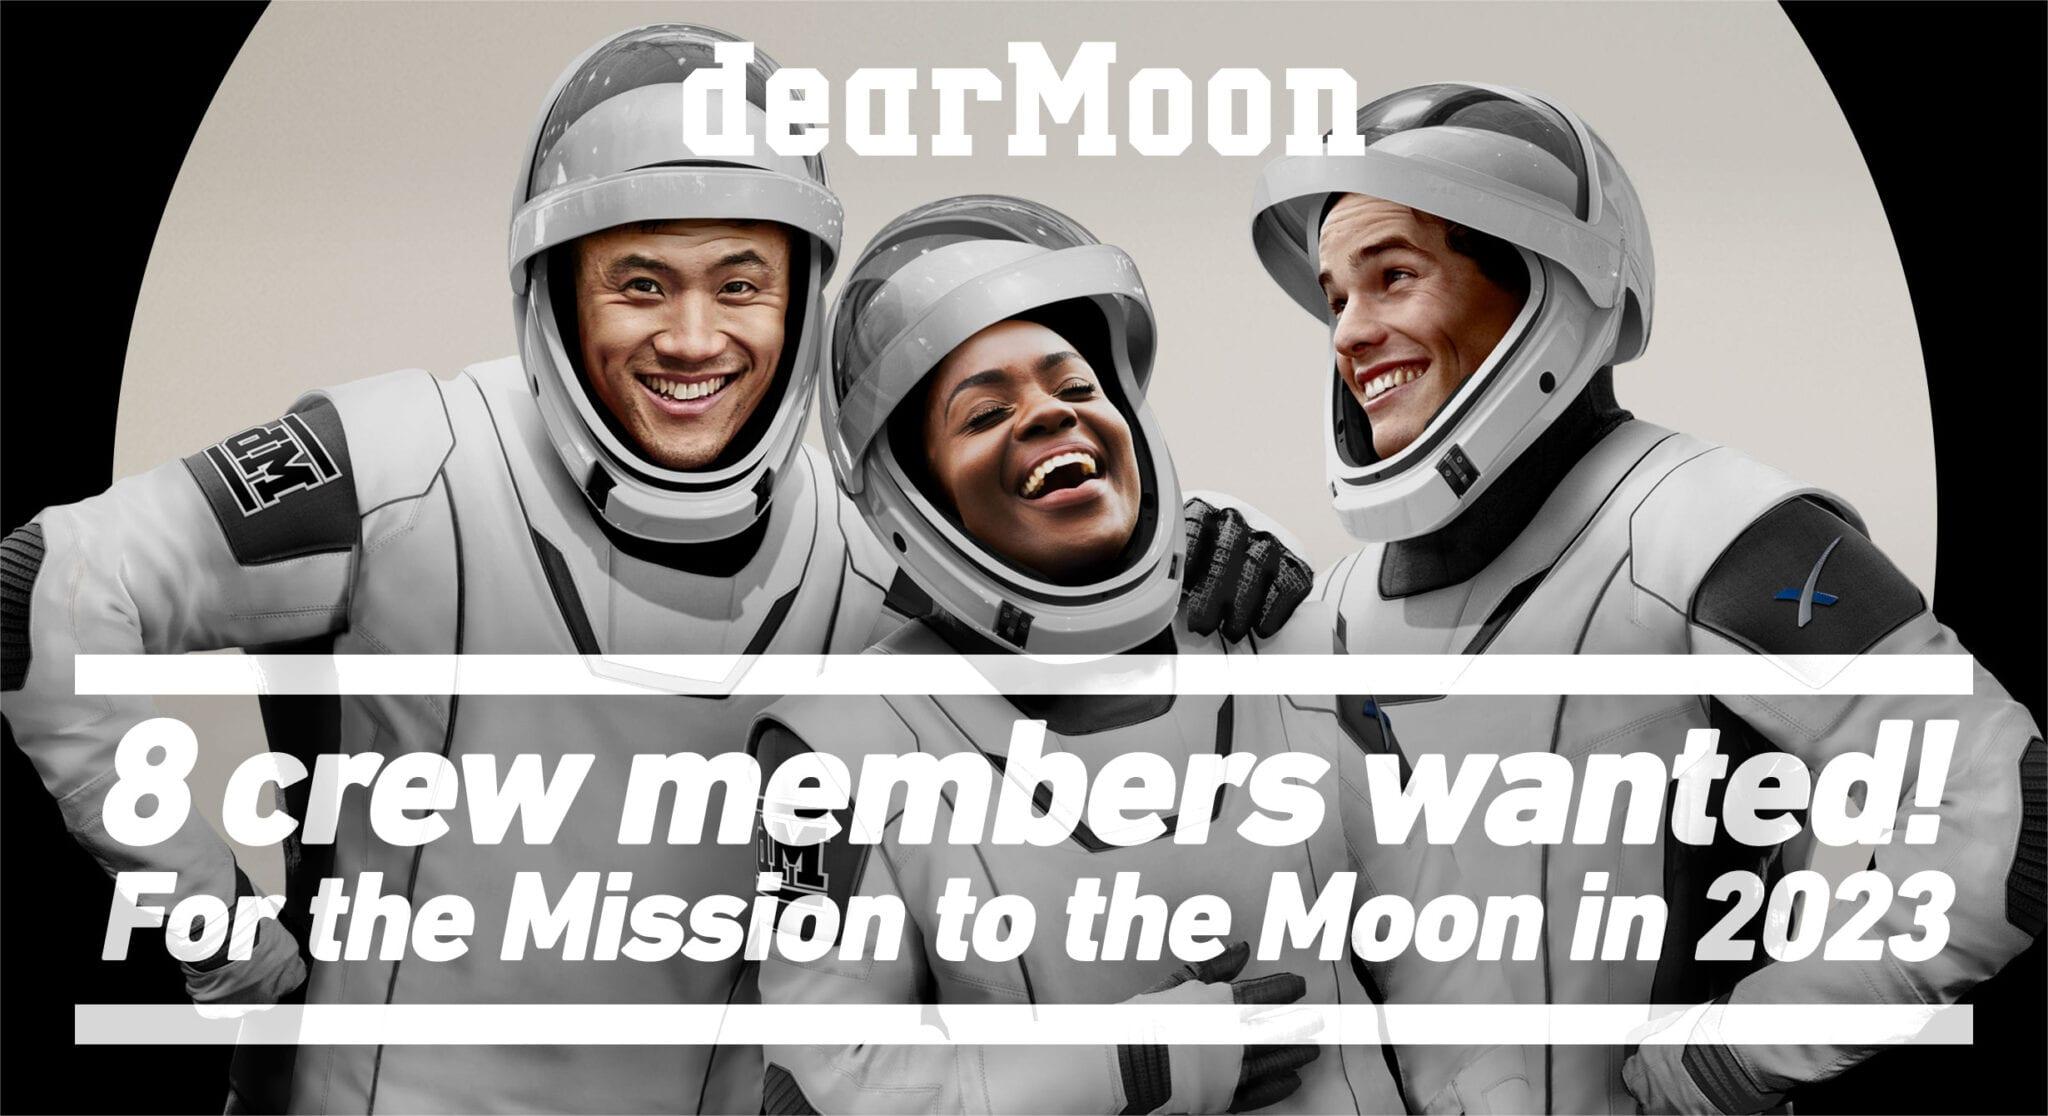 Invitan a aventura espacial